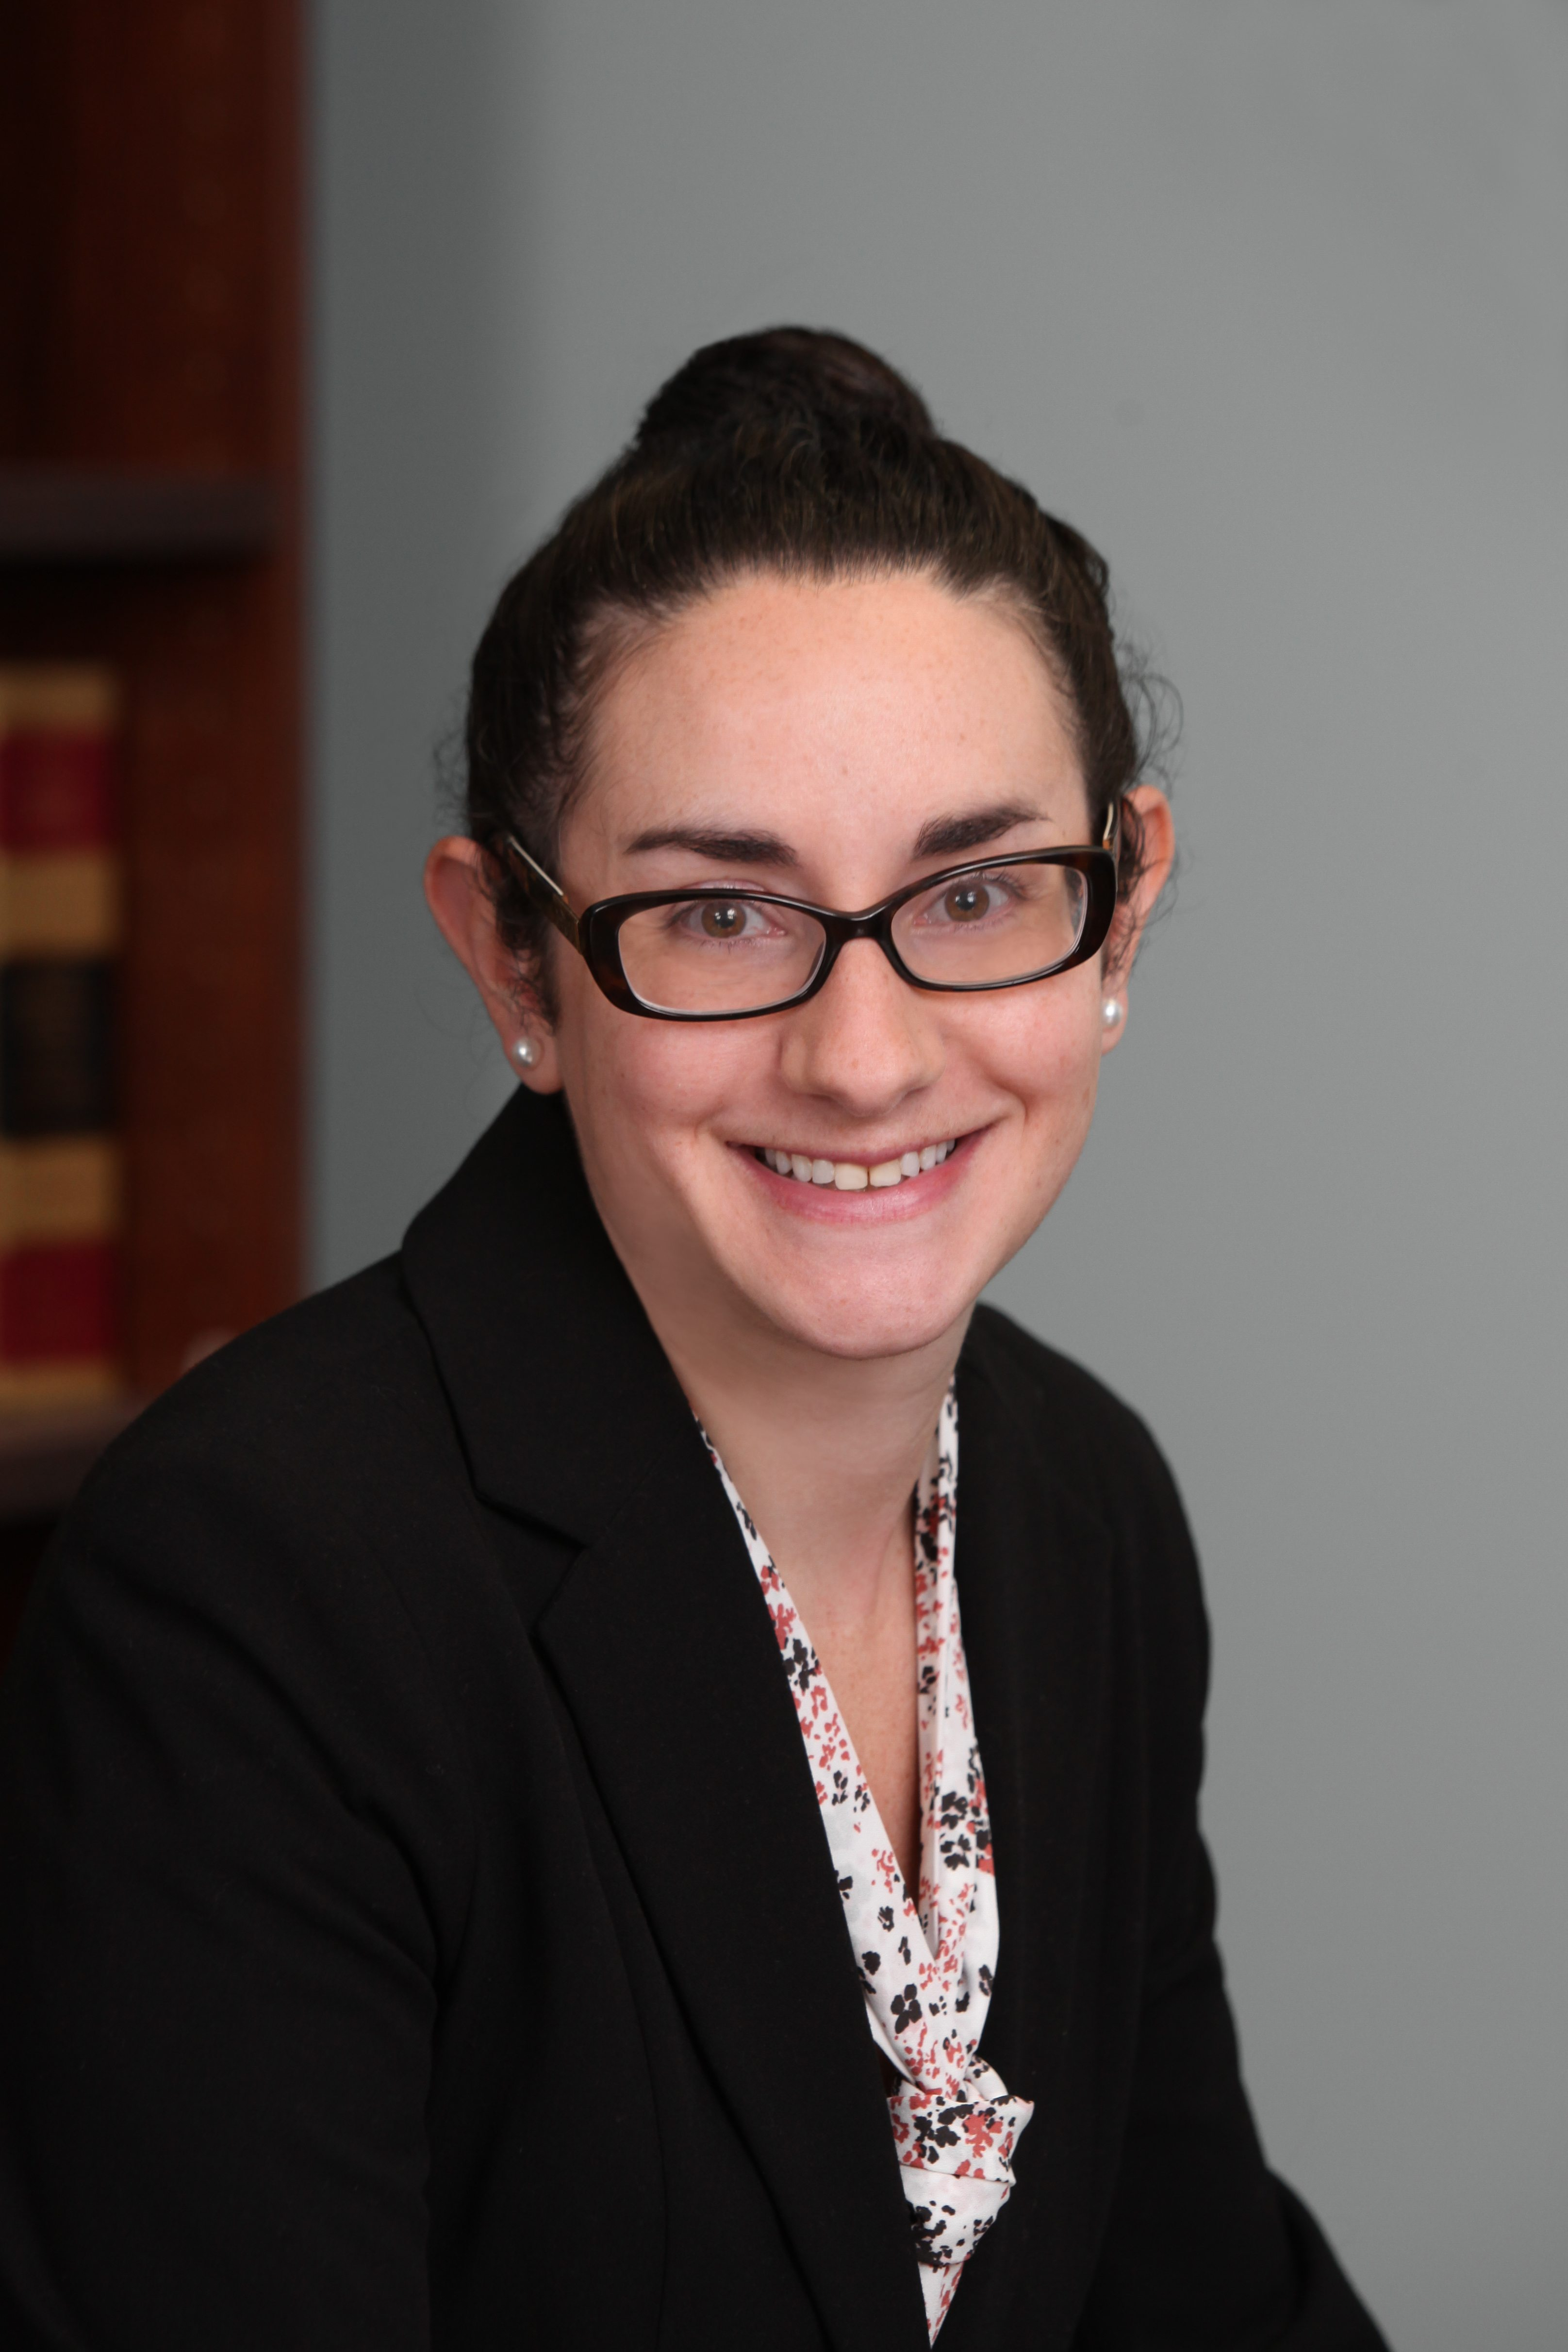 Long Island Estate Planning Associate Michelle Dantuono